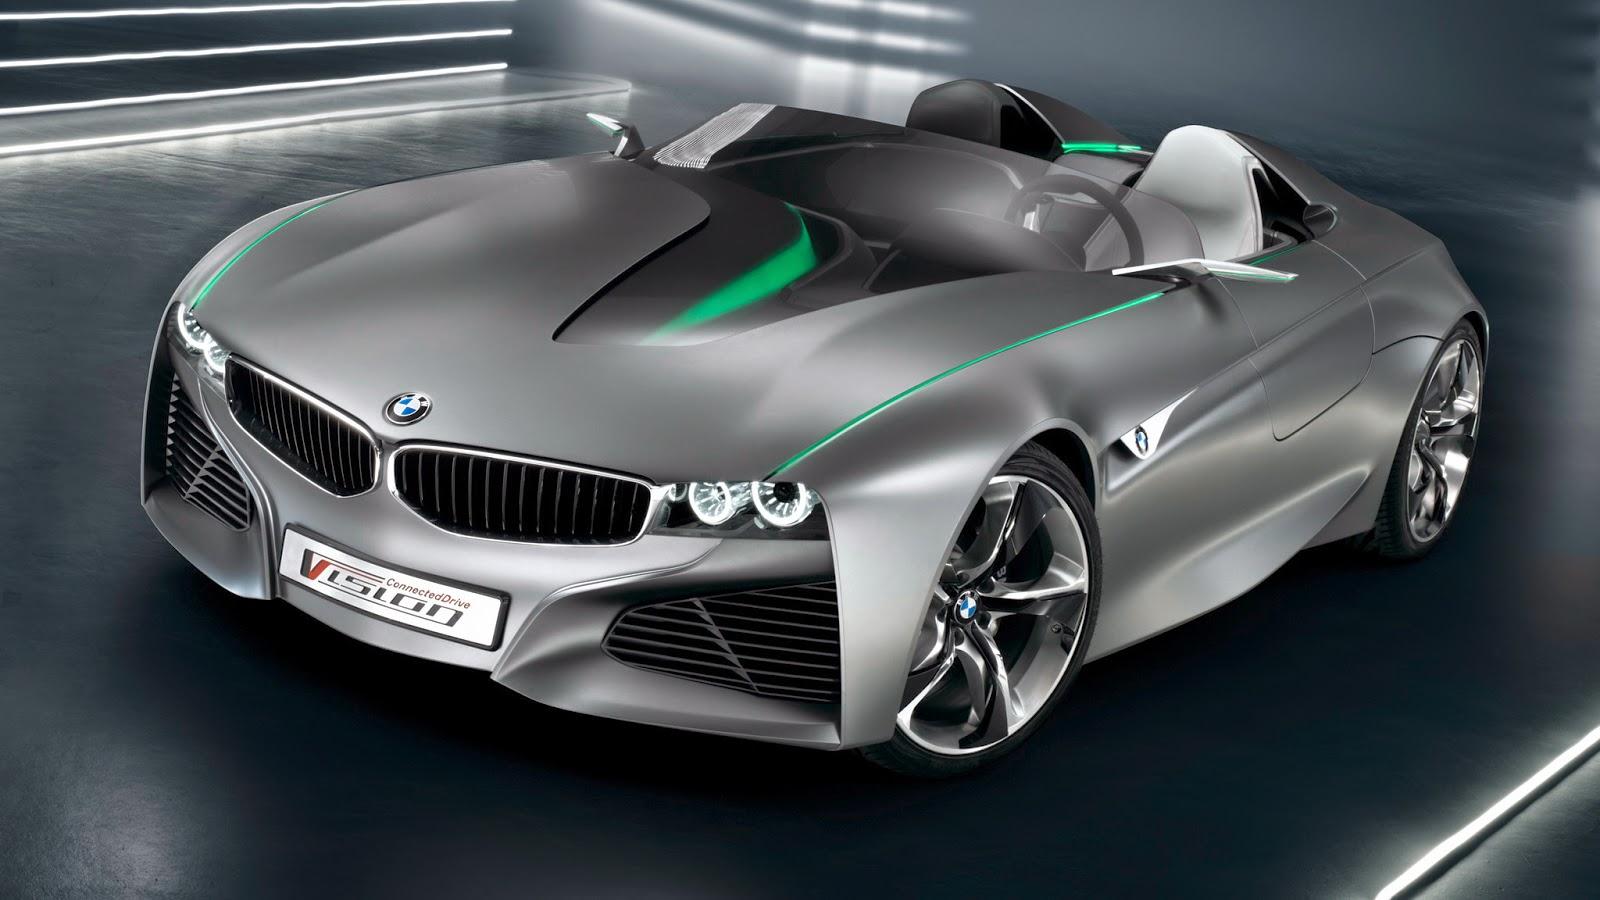 Bmw vision concept car wallpaper free download hd - Bmw cars wallpapers hd free download ...